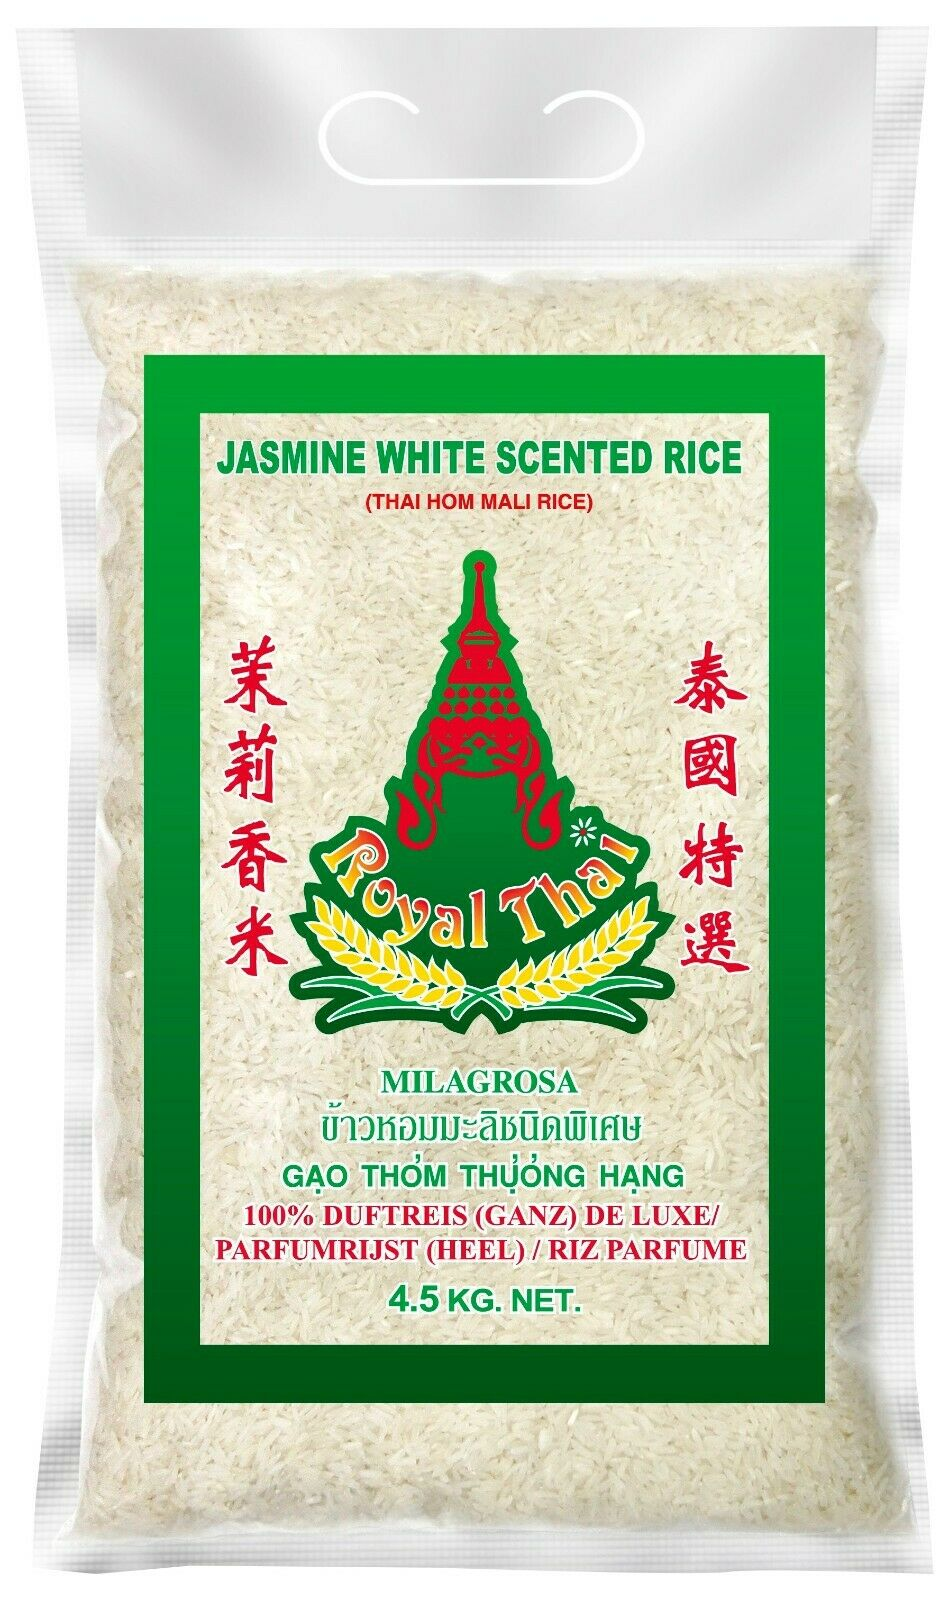 4,5kg Bigpack Royal Thai Langkorn Duftreis Jasminreis Reis aus Thailand